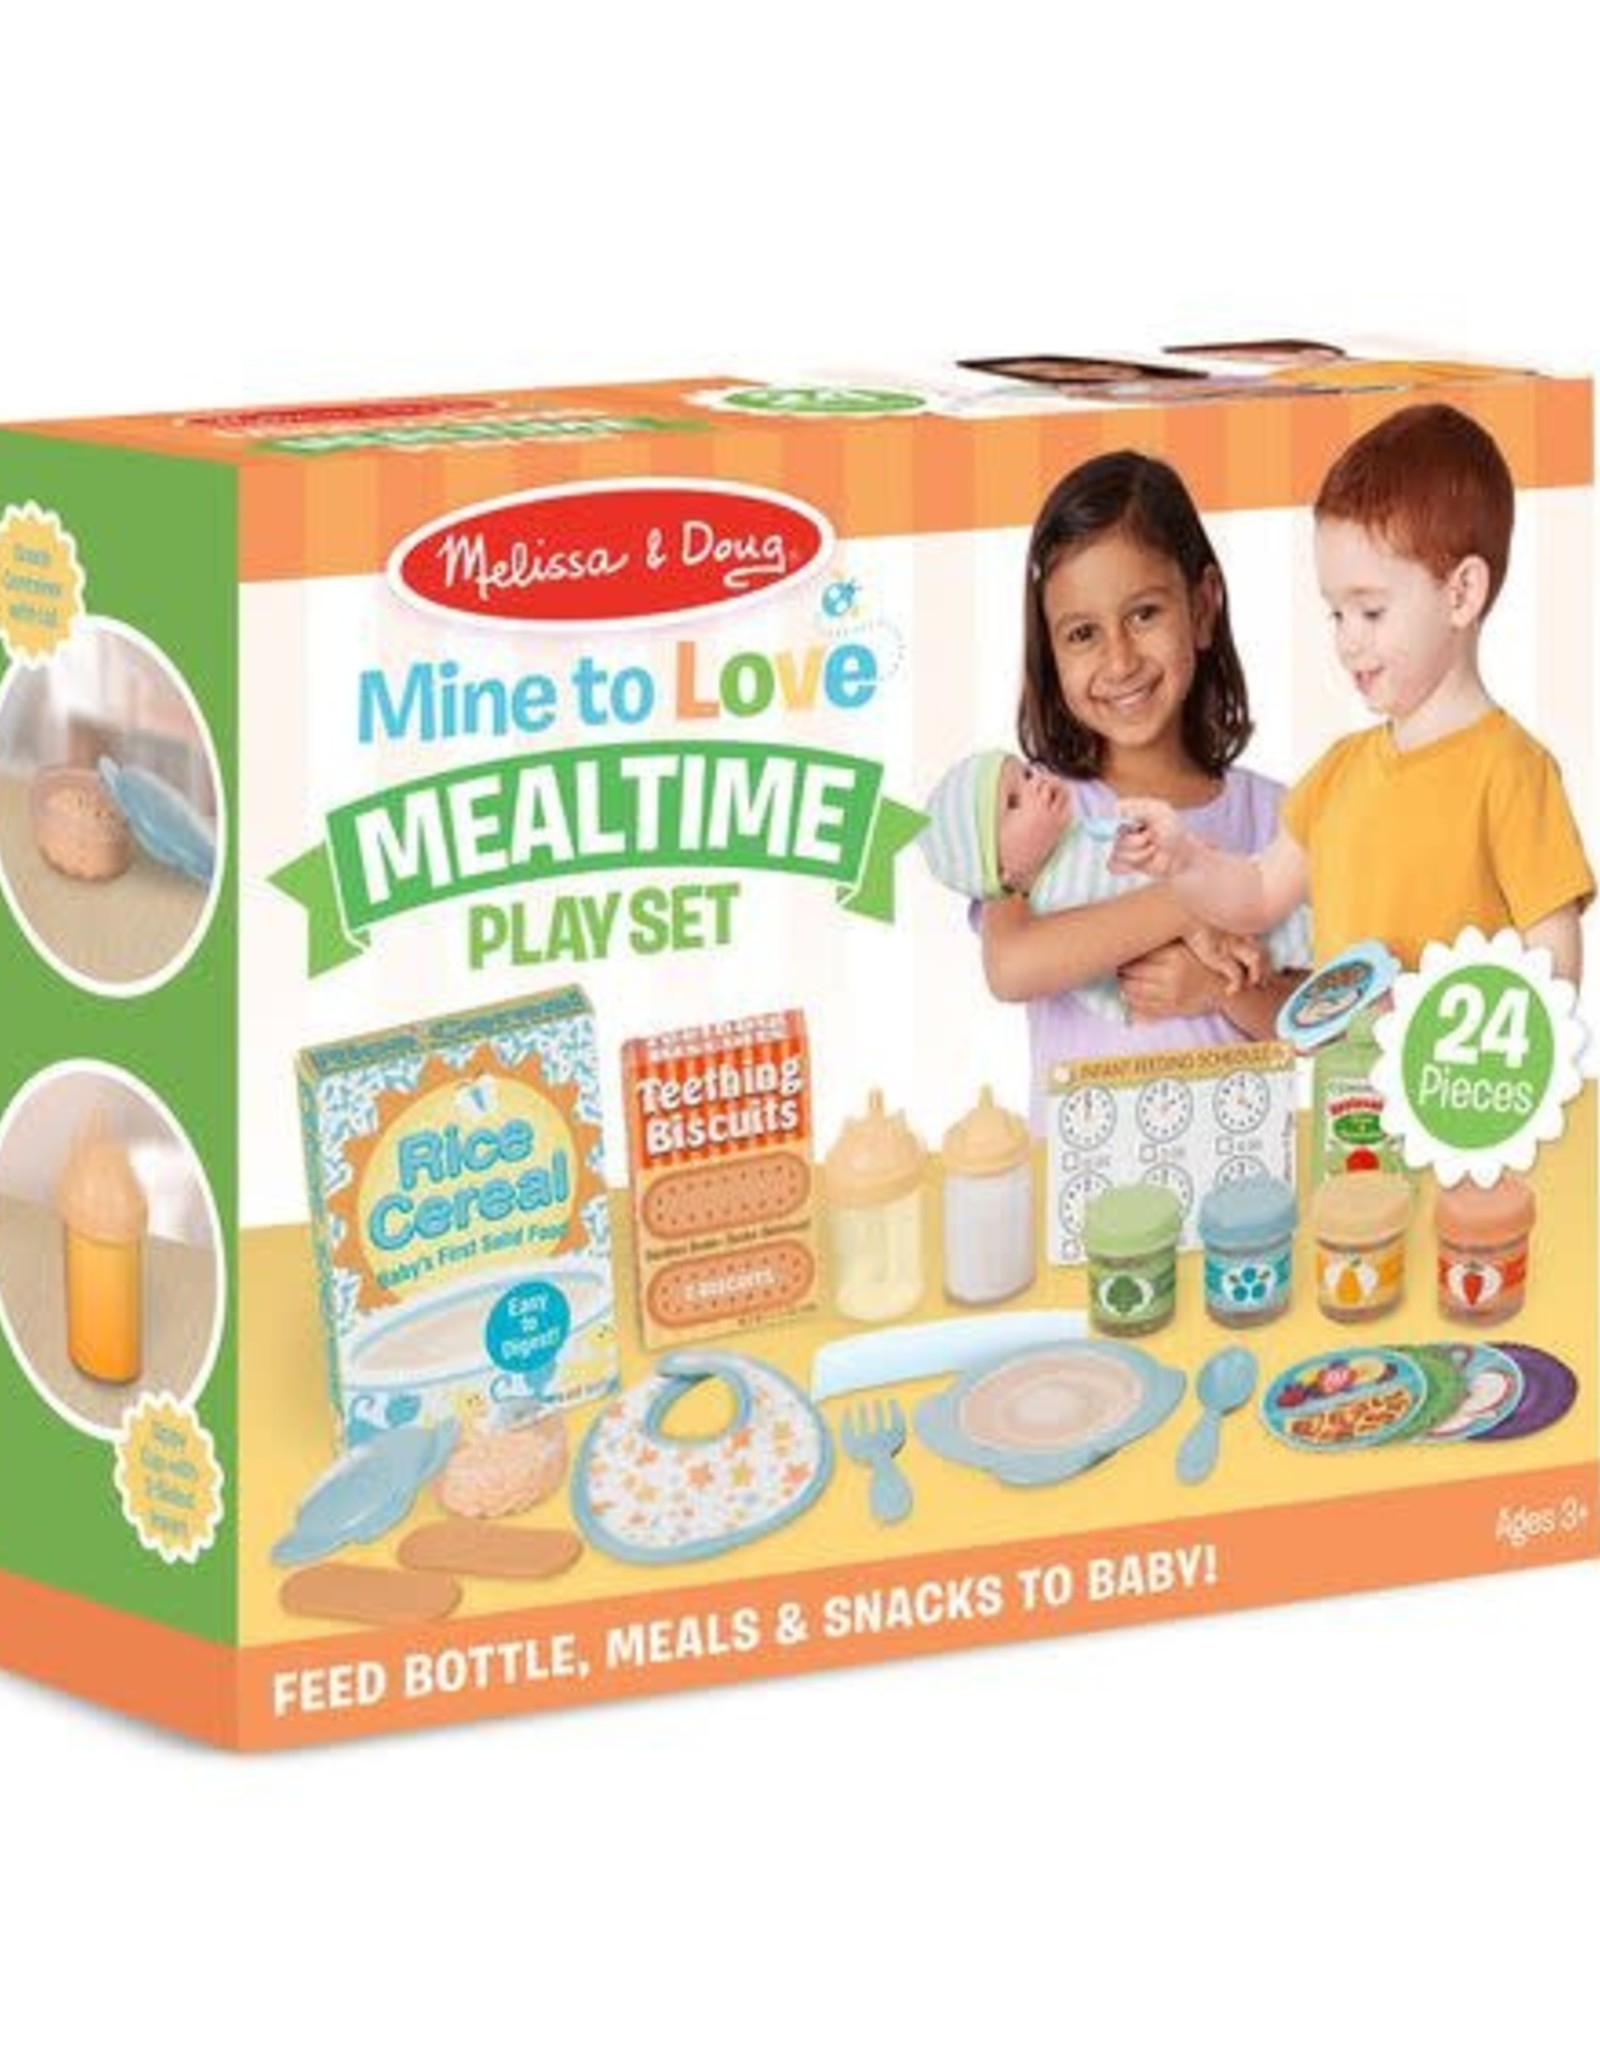 Melissa & Doug Melissa & Doug Mine to Love Mealtime Play Set